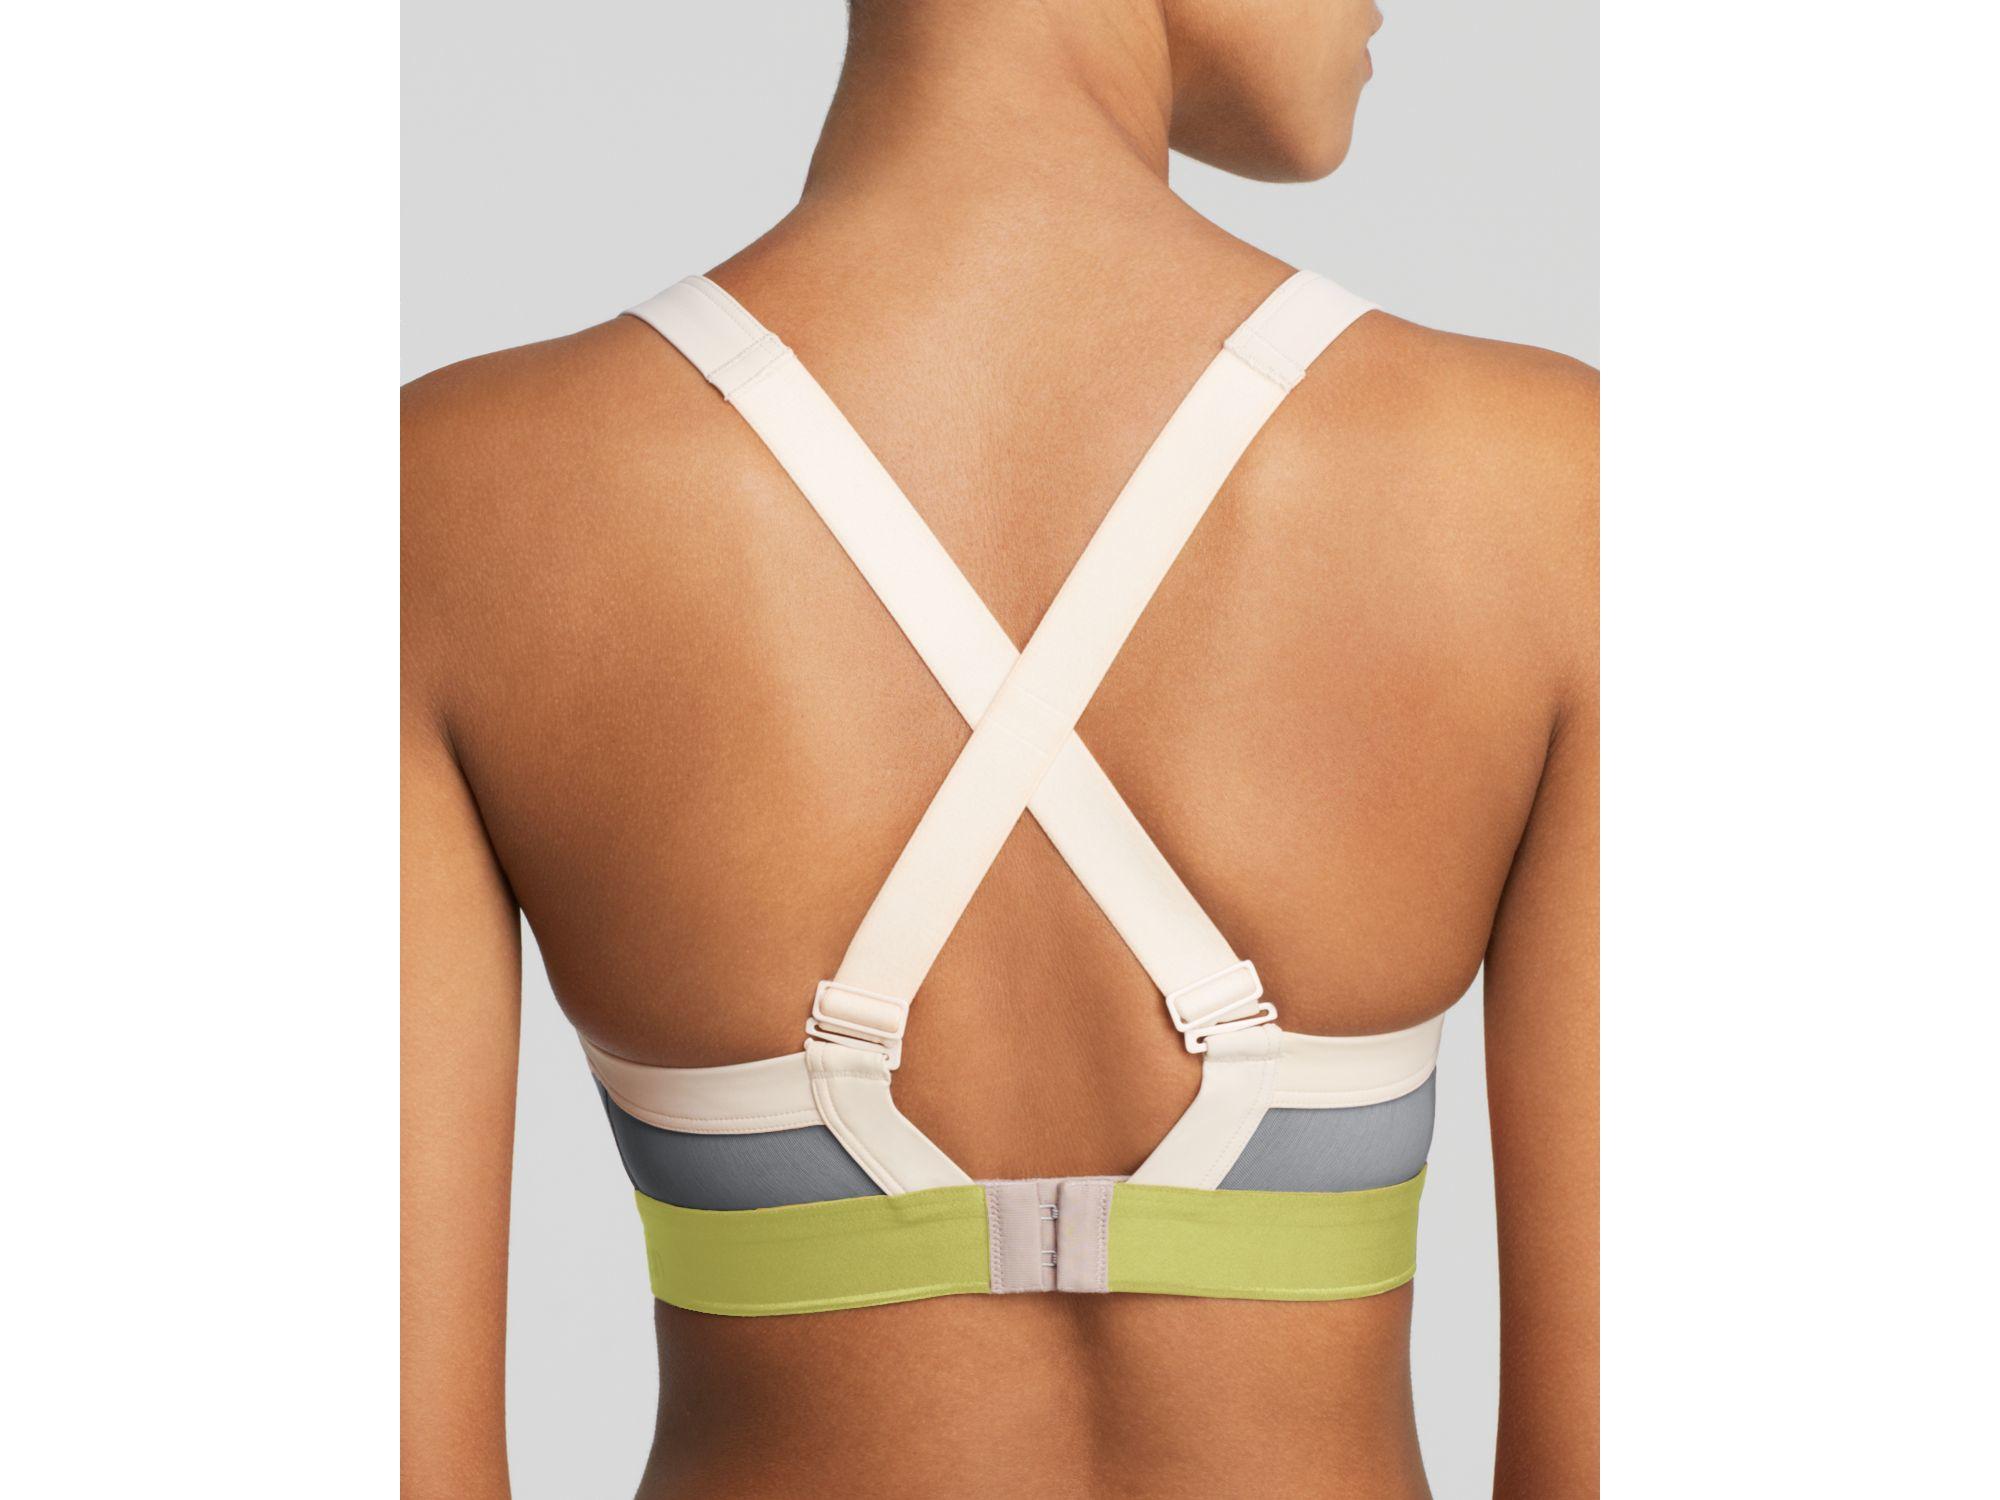 b8f2c7a7de Calvin Klein Sports Bra - Flex Motion Convertible High Impact ...